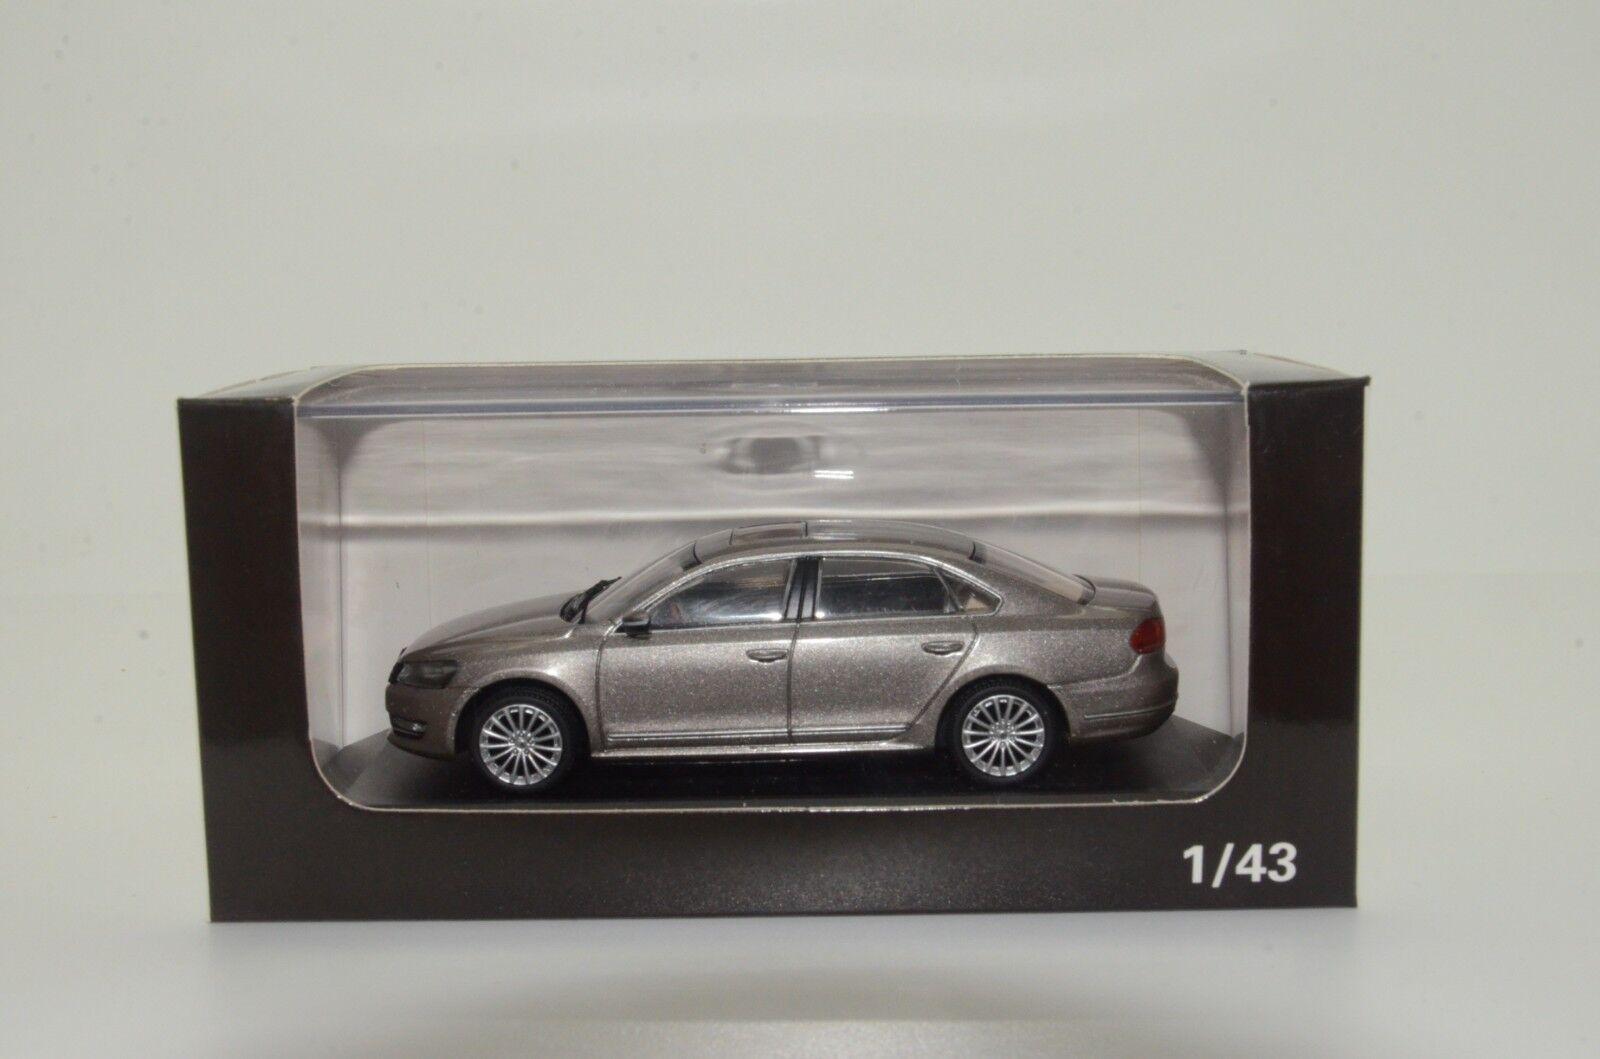 VW Shanghai New Passat Passat Passat  1 43 55c315